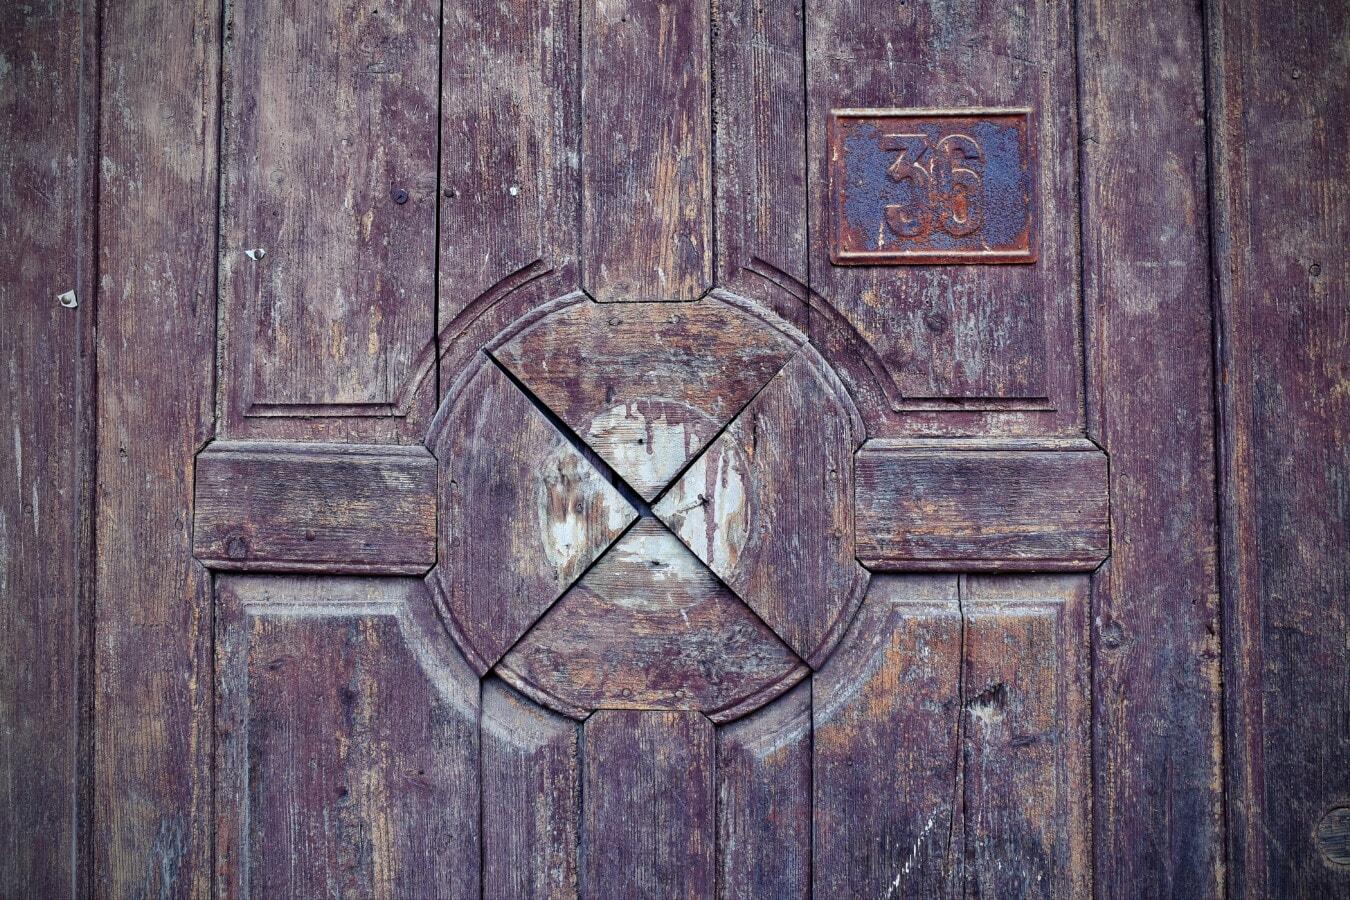 decay, front door, old, iron, rust, number, grunge, wood, retro, wooden